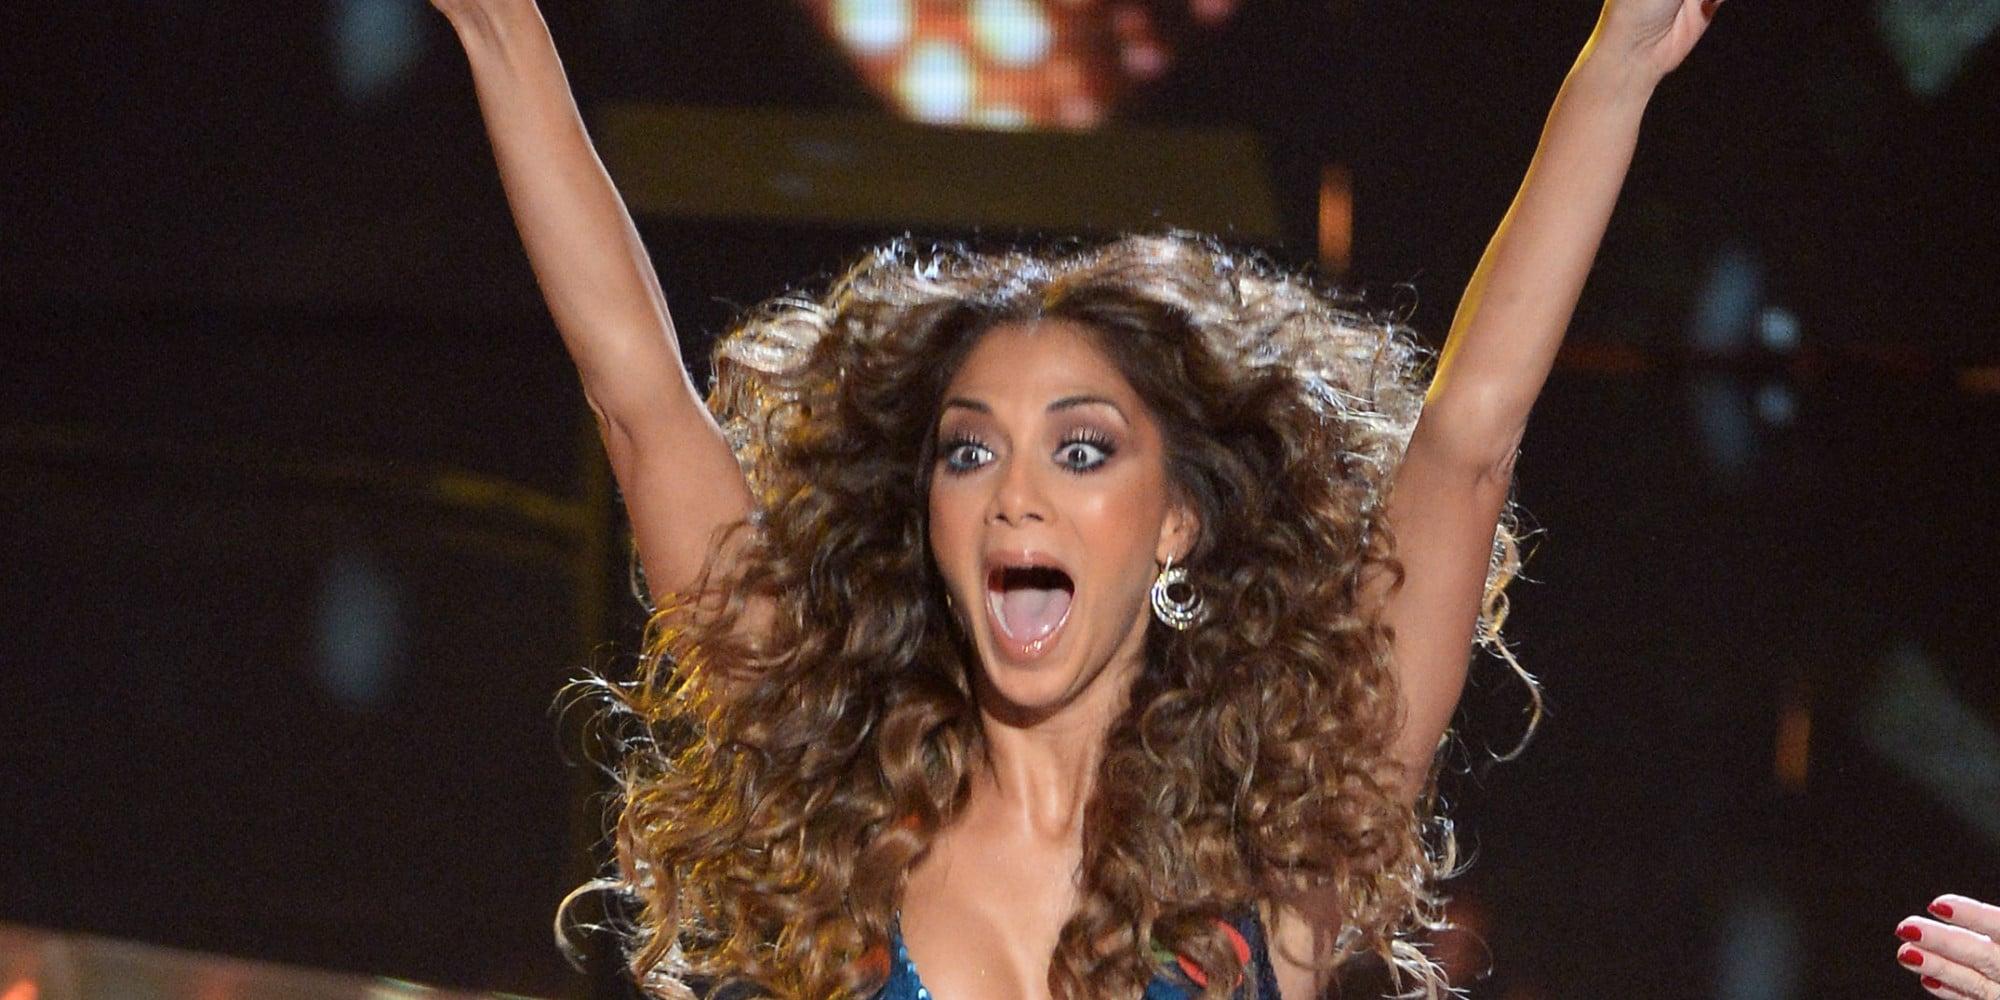 Photo of OMG! Nicole Scherzinger impazzisce ad X Factor: ecco il VIDEO VIRALE